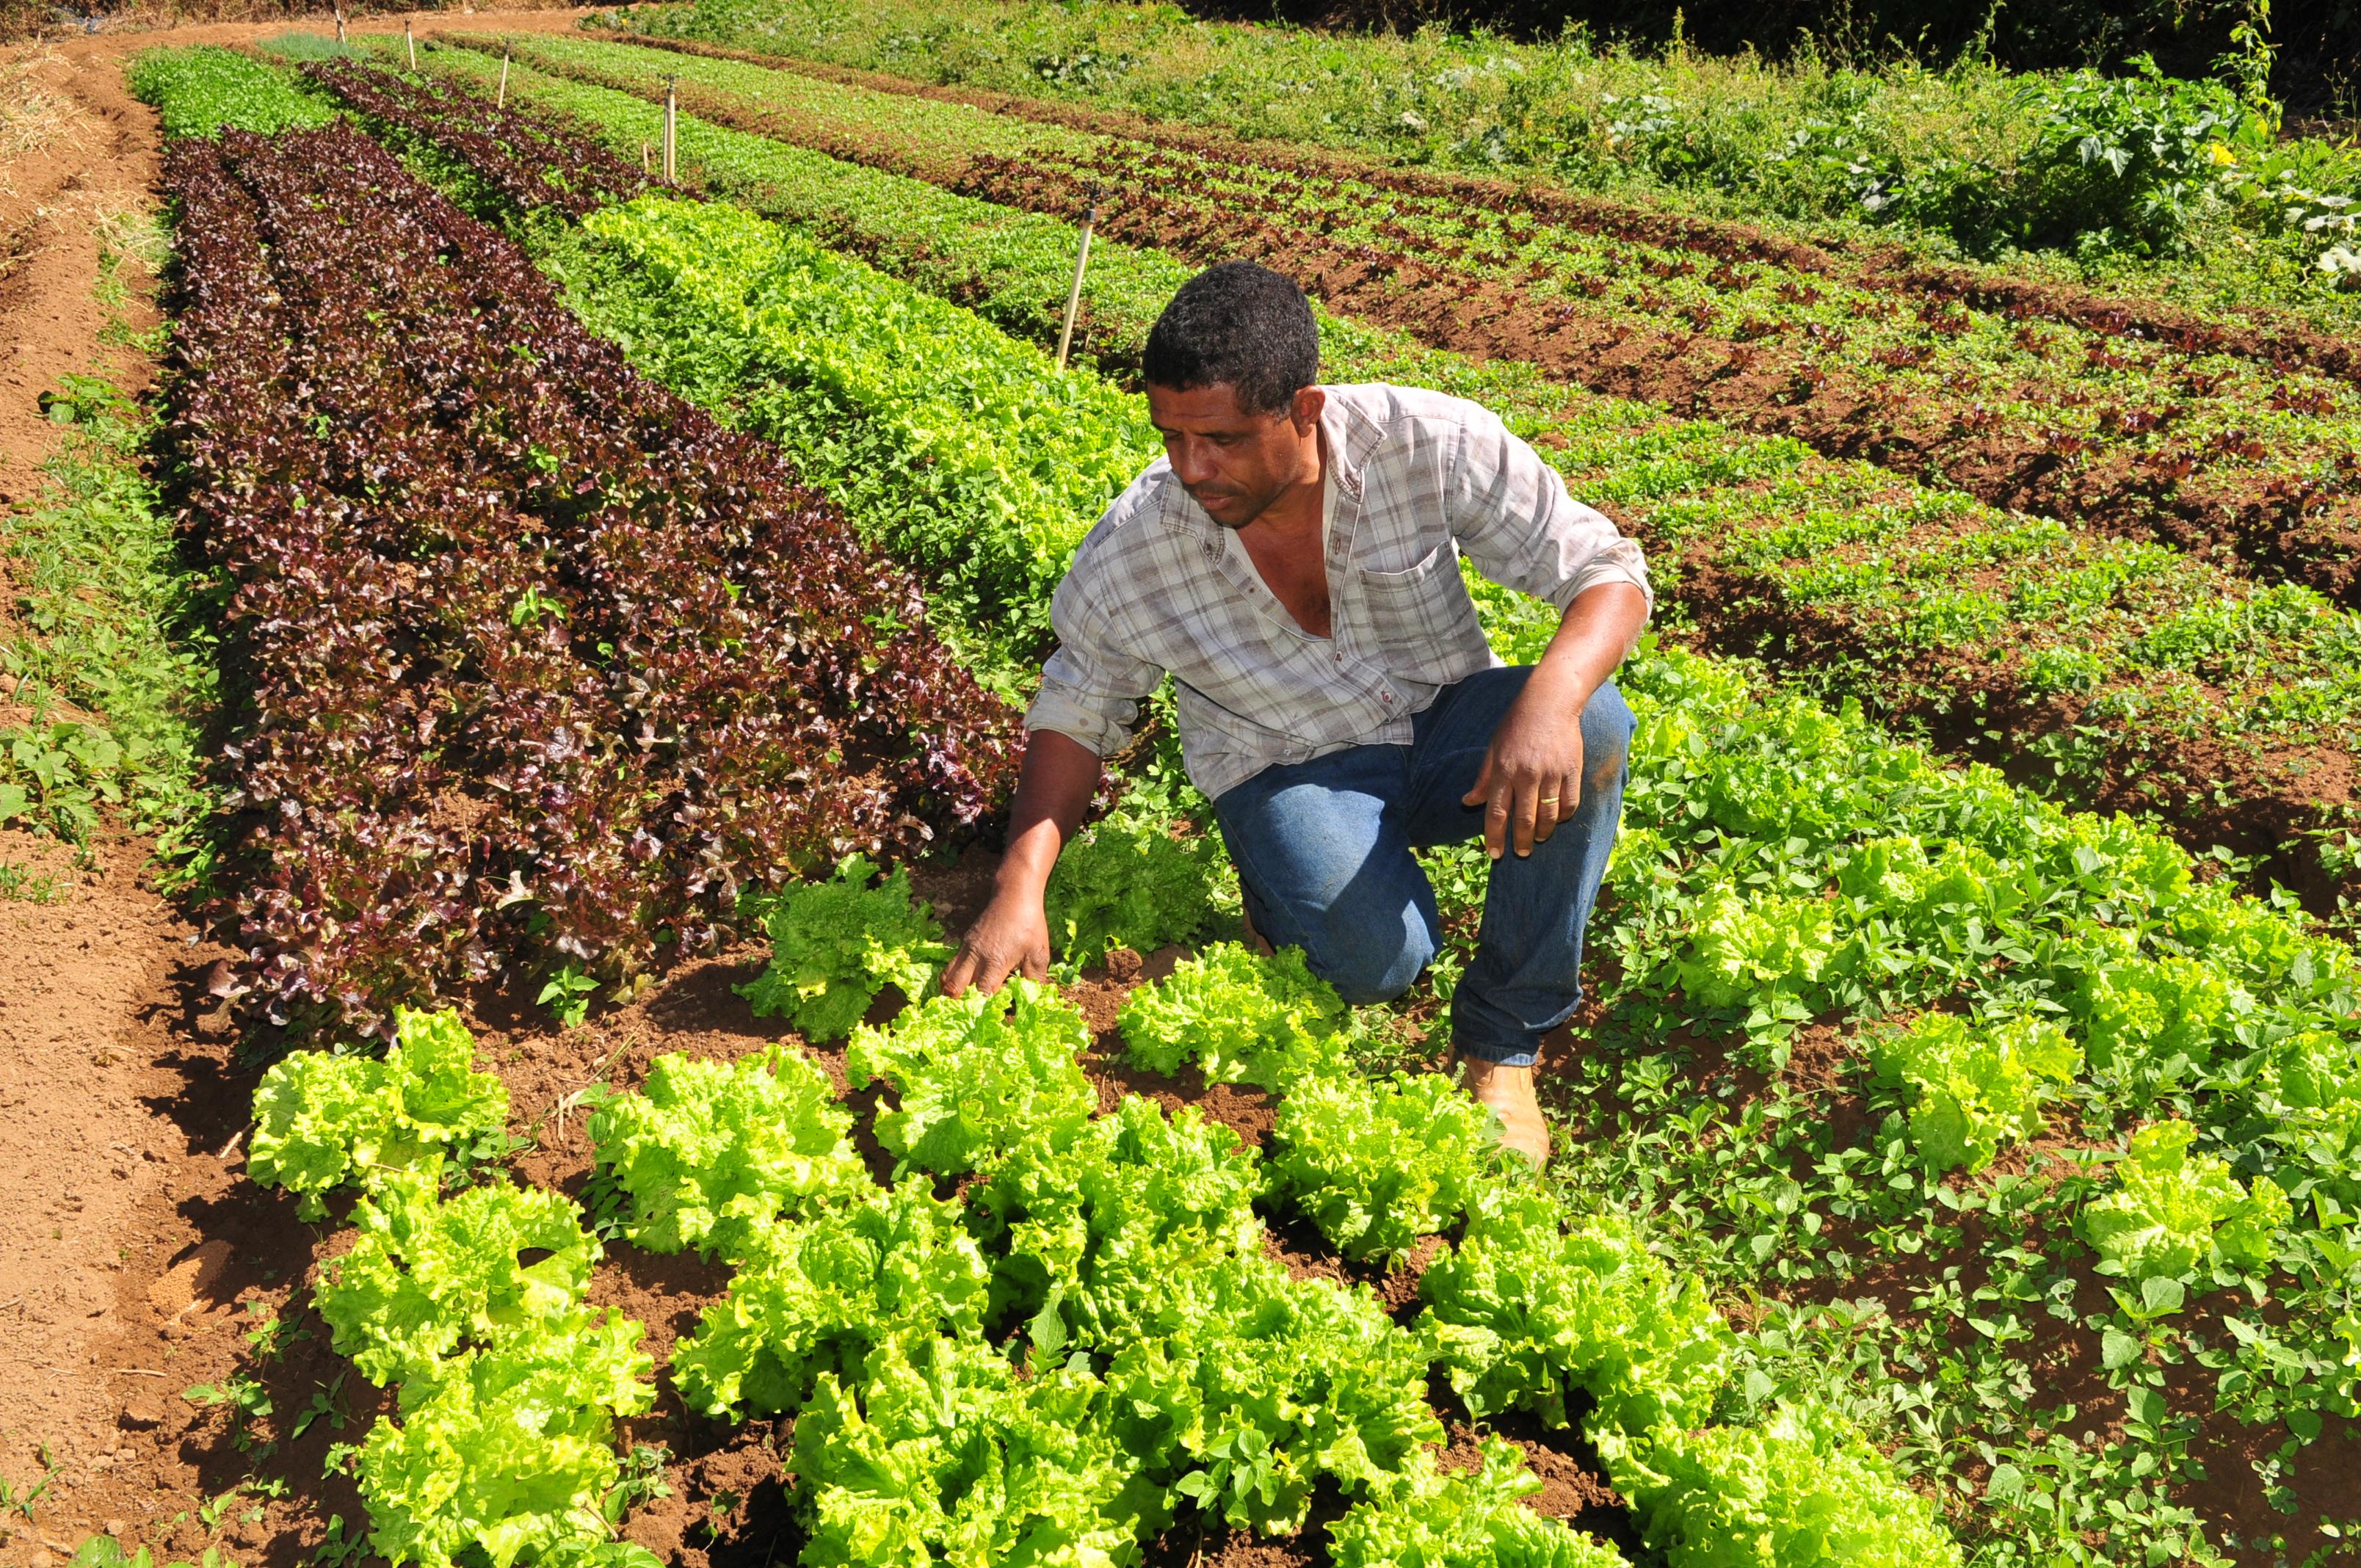 produtor rural Foto Tony Winston Agência Brasília